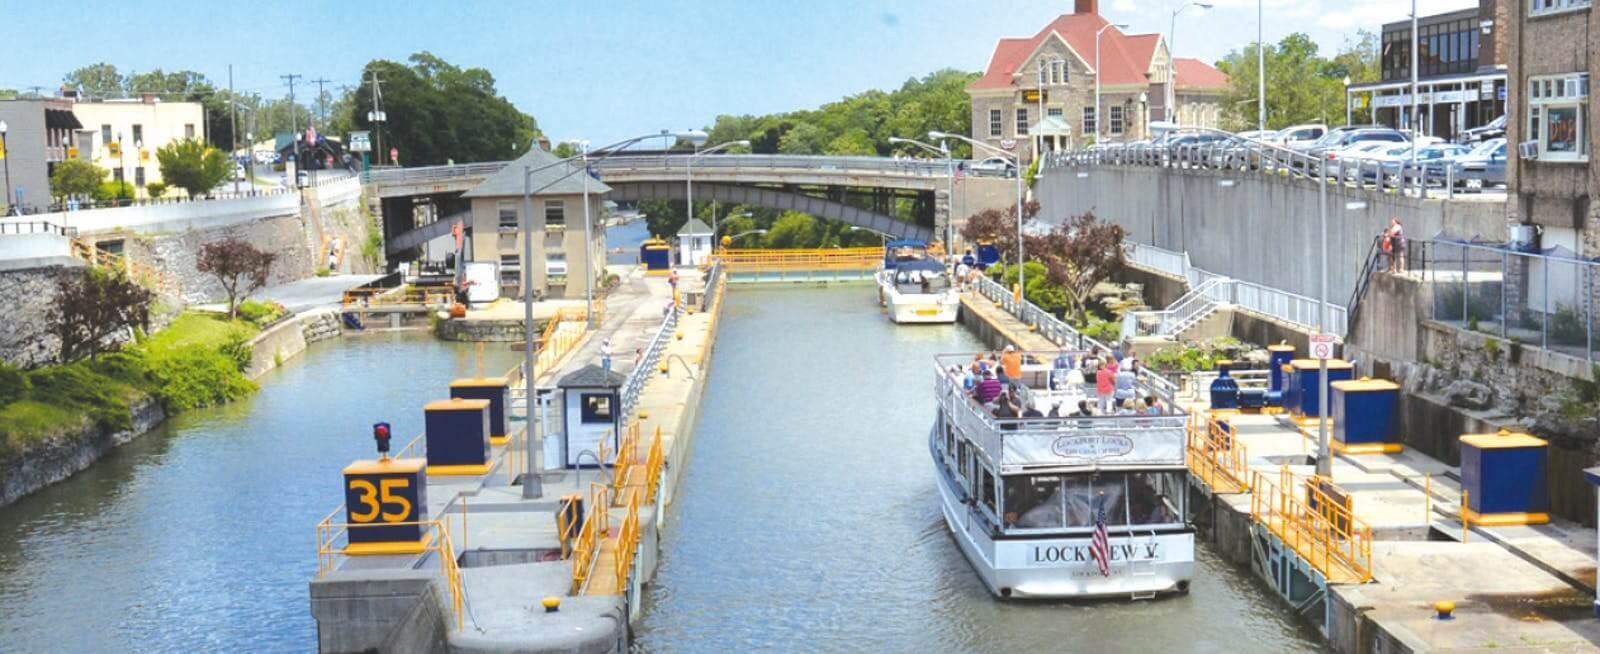 Reimagine the Canals